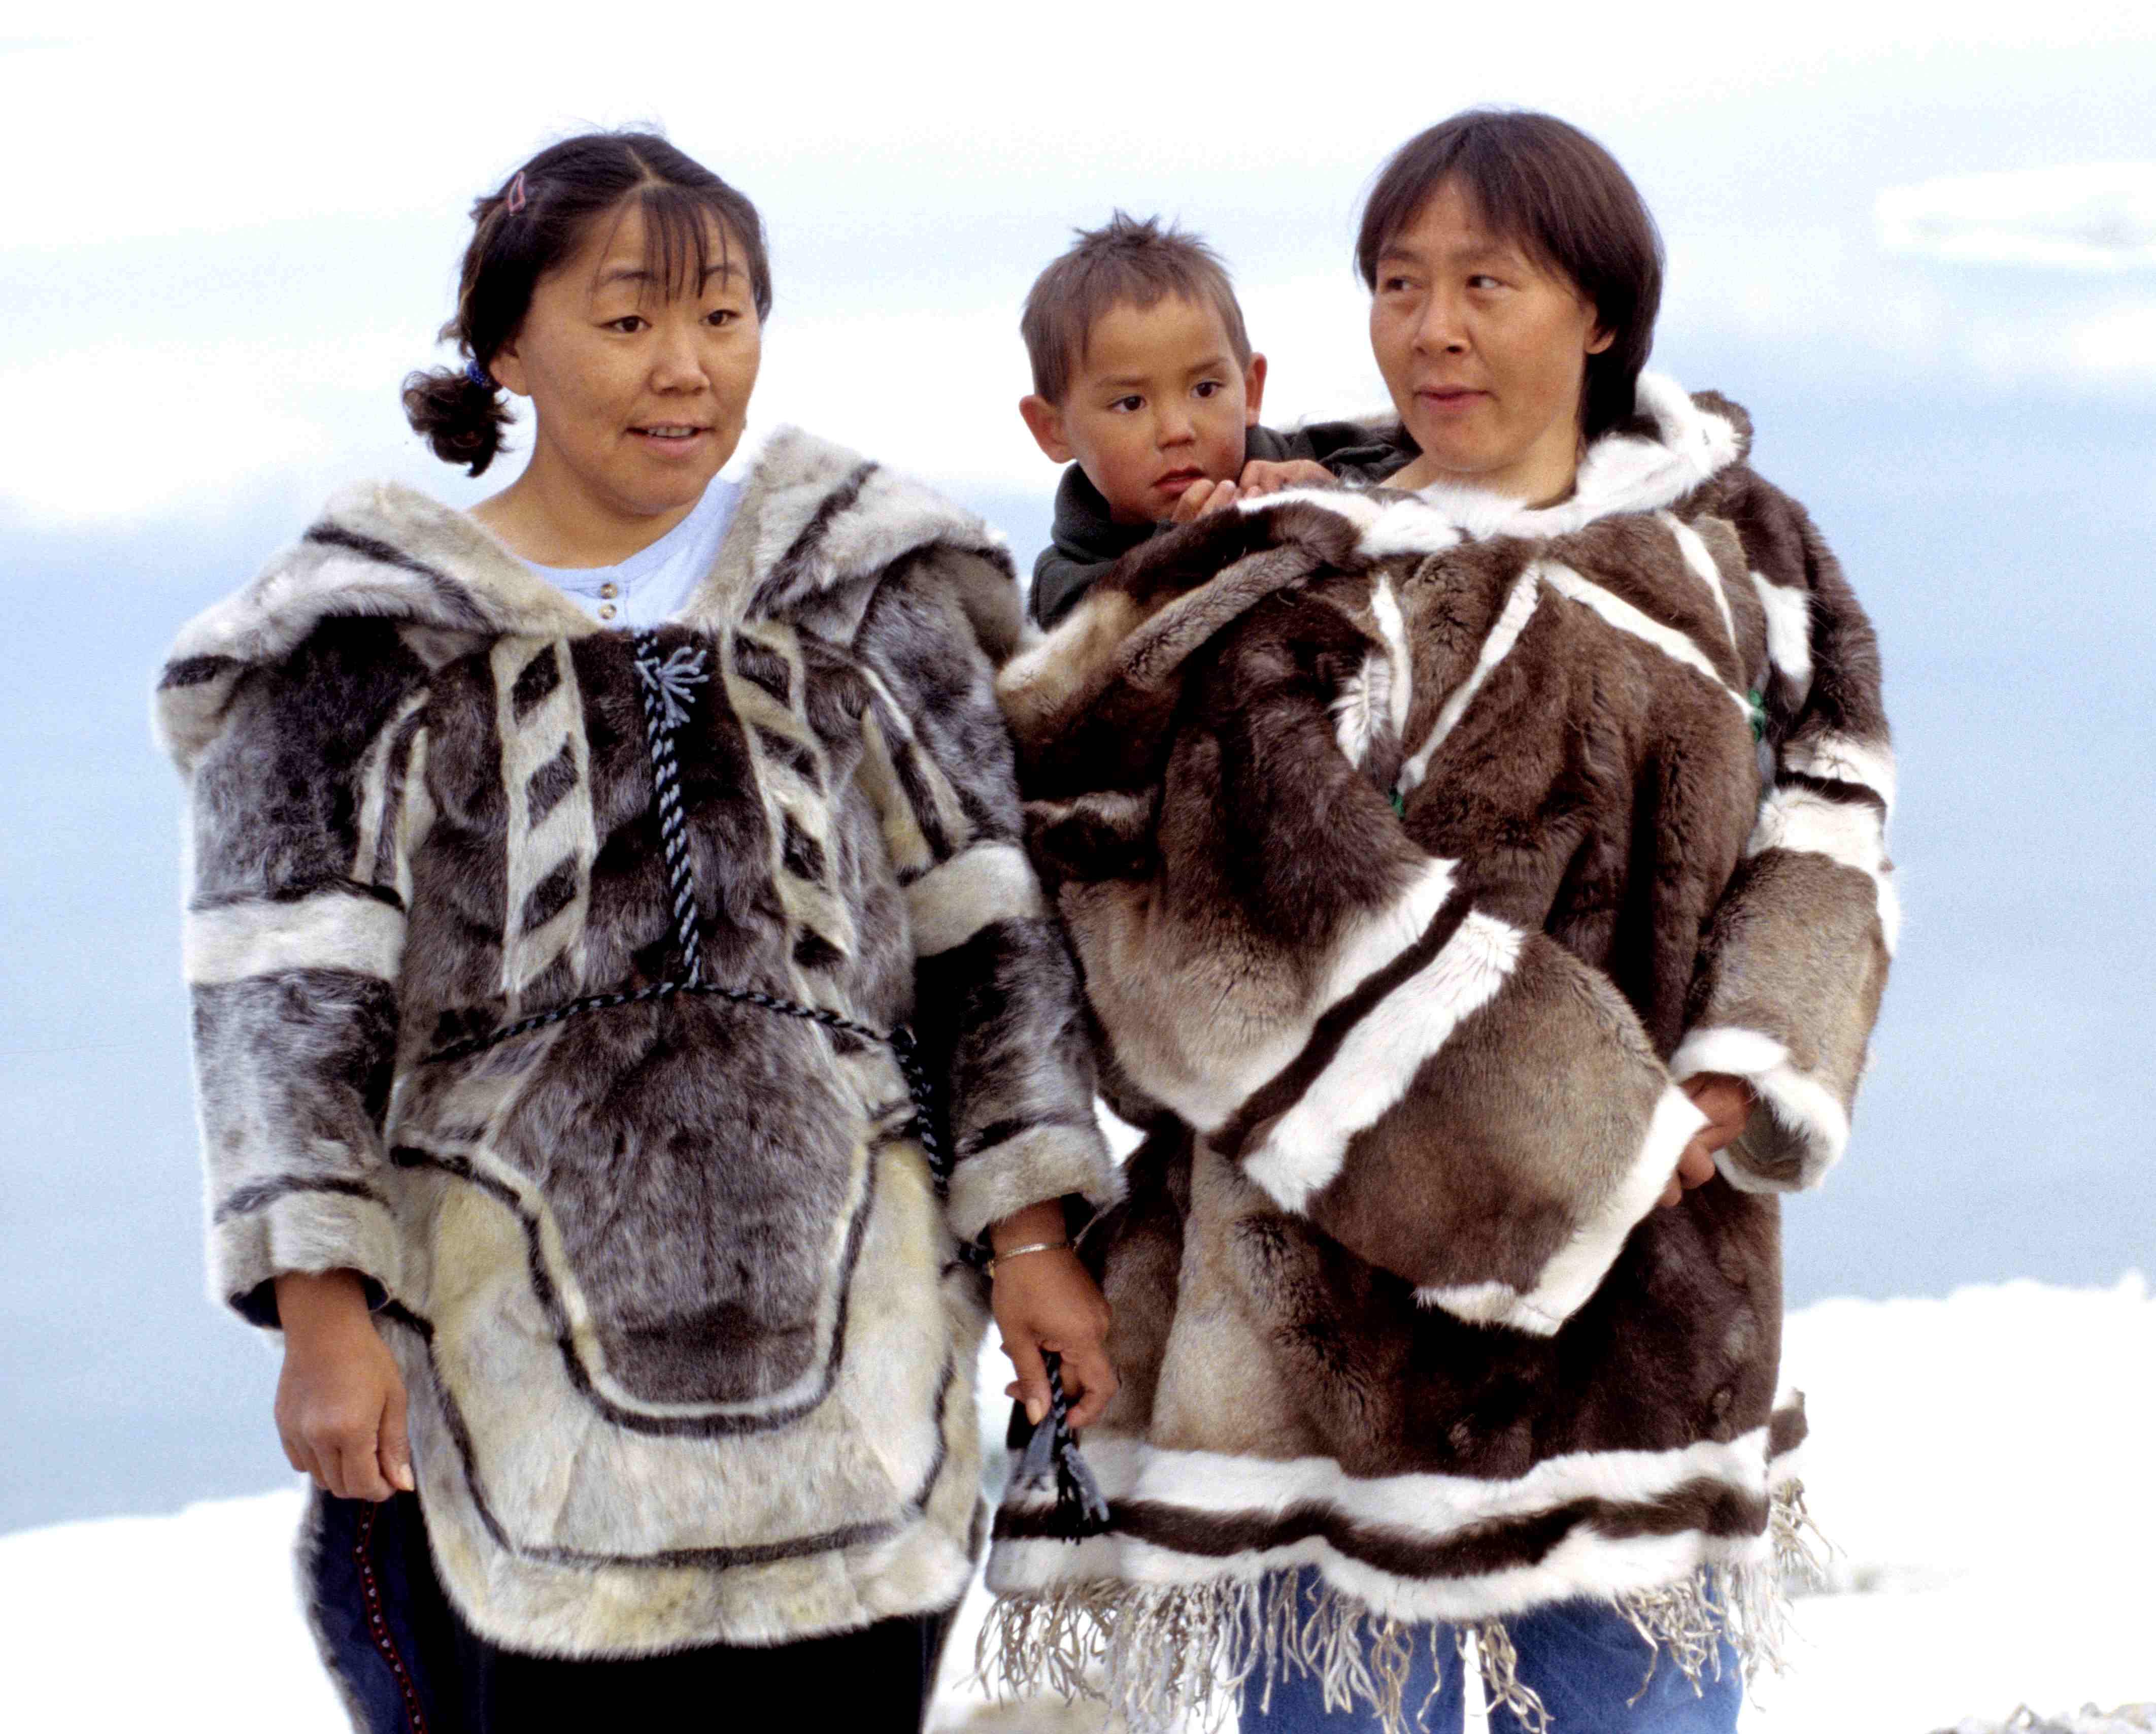 мир, фото народности инуит фирма предлагает